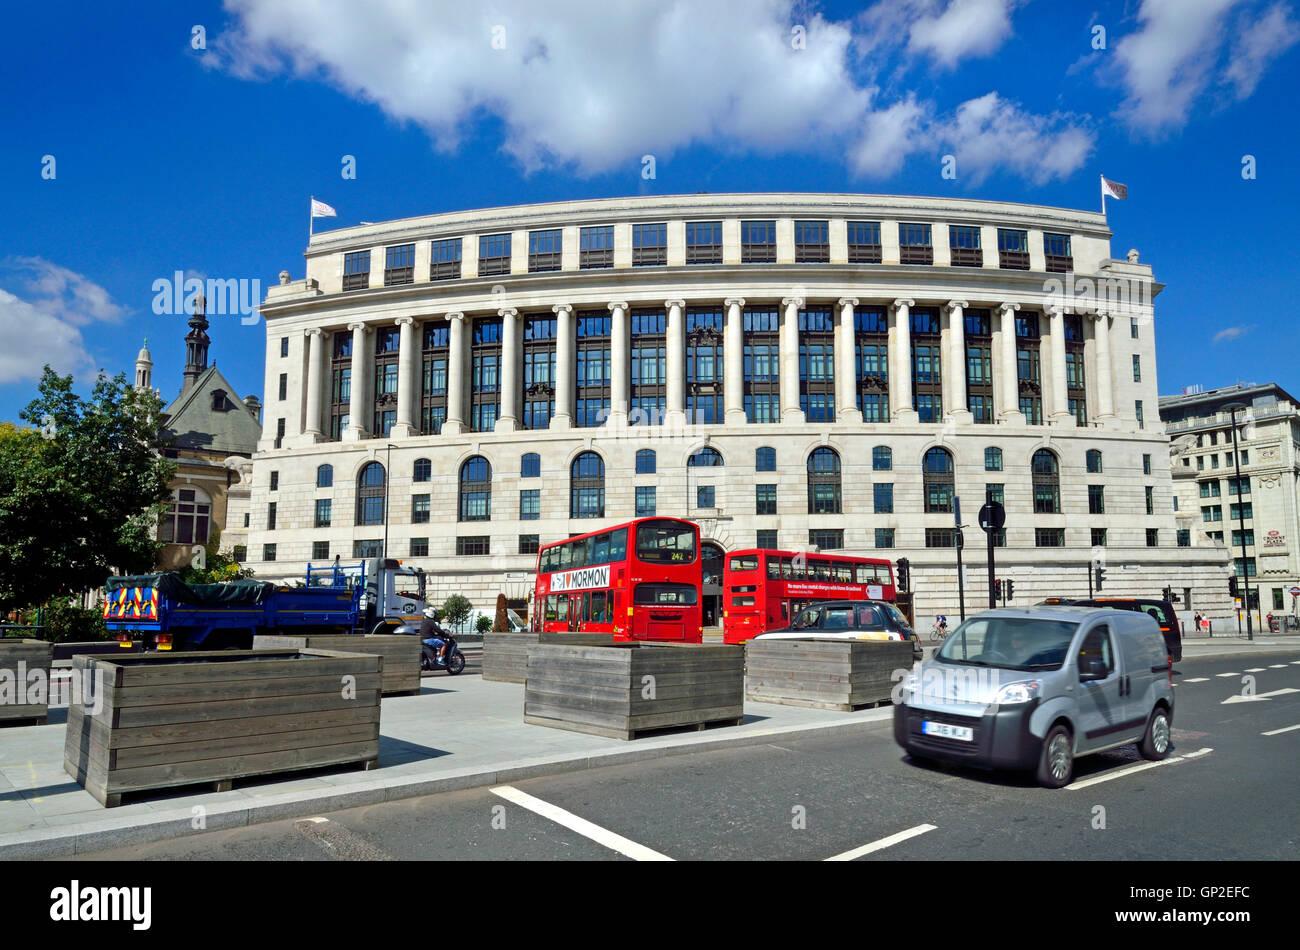 London, England, UK. Unilever House (1933: Neoclassical Art Deco) at 100, Victoria Embankment. Stock Photo